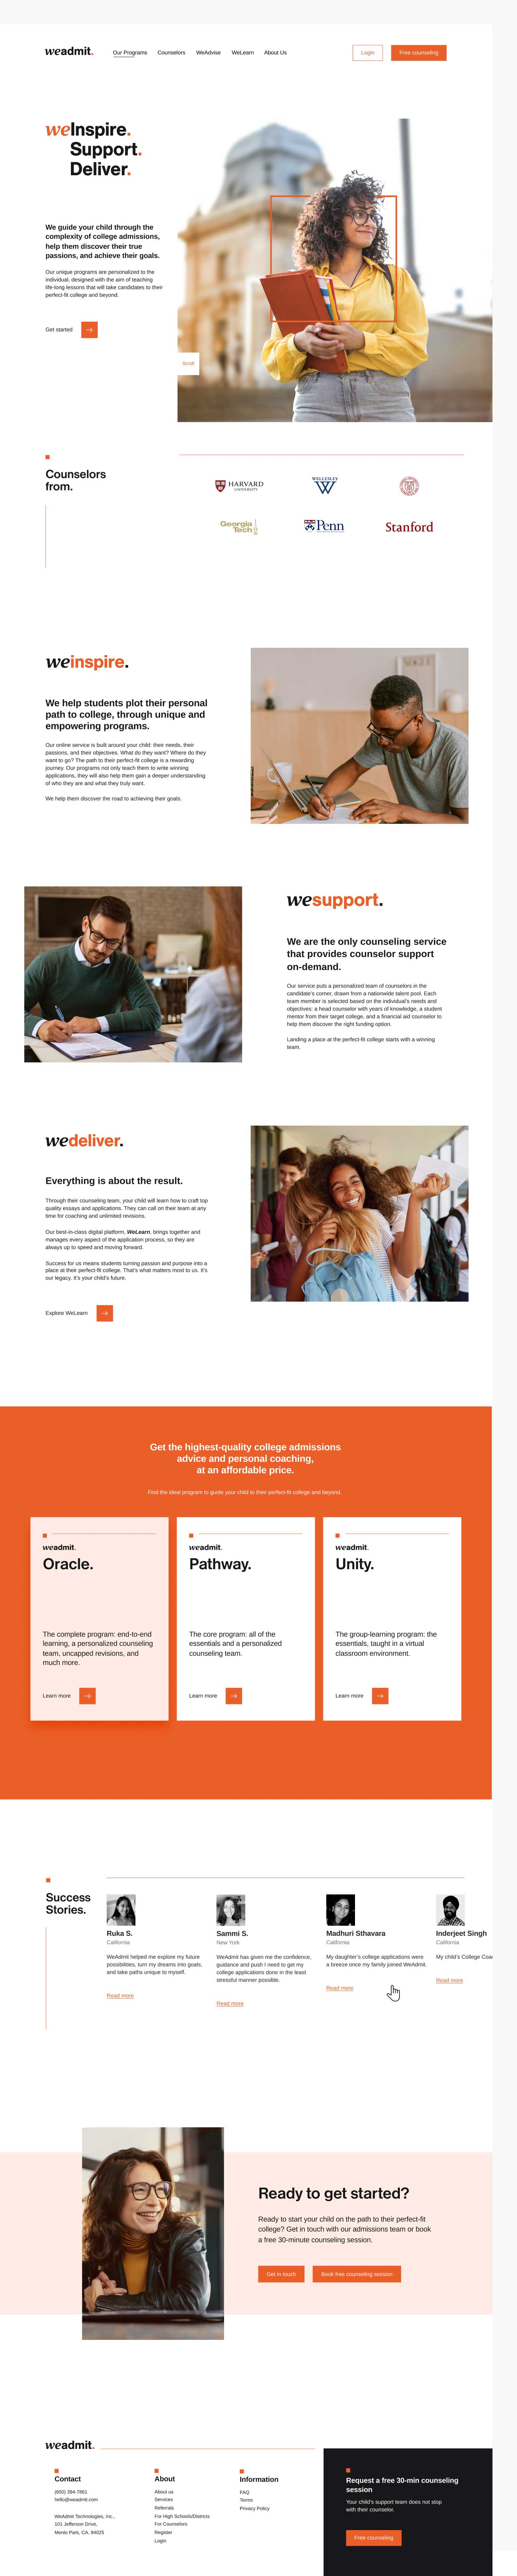 weadmit homepage designed by zypsy